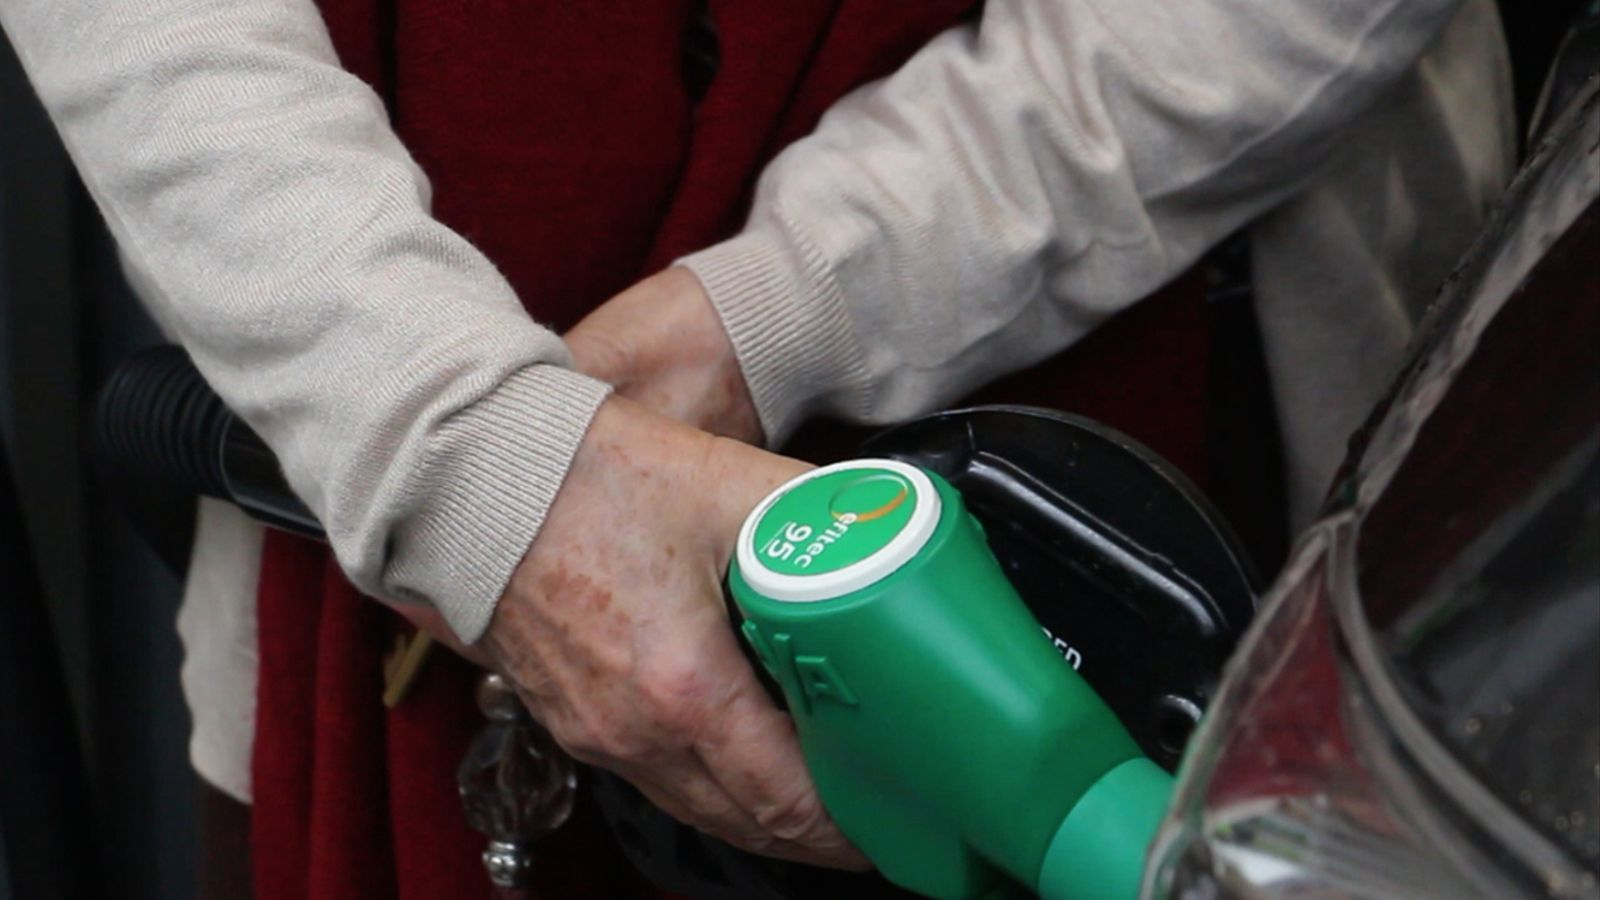 Sortidor de benzina / ANA